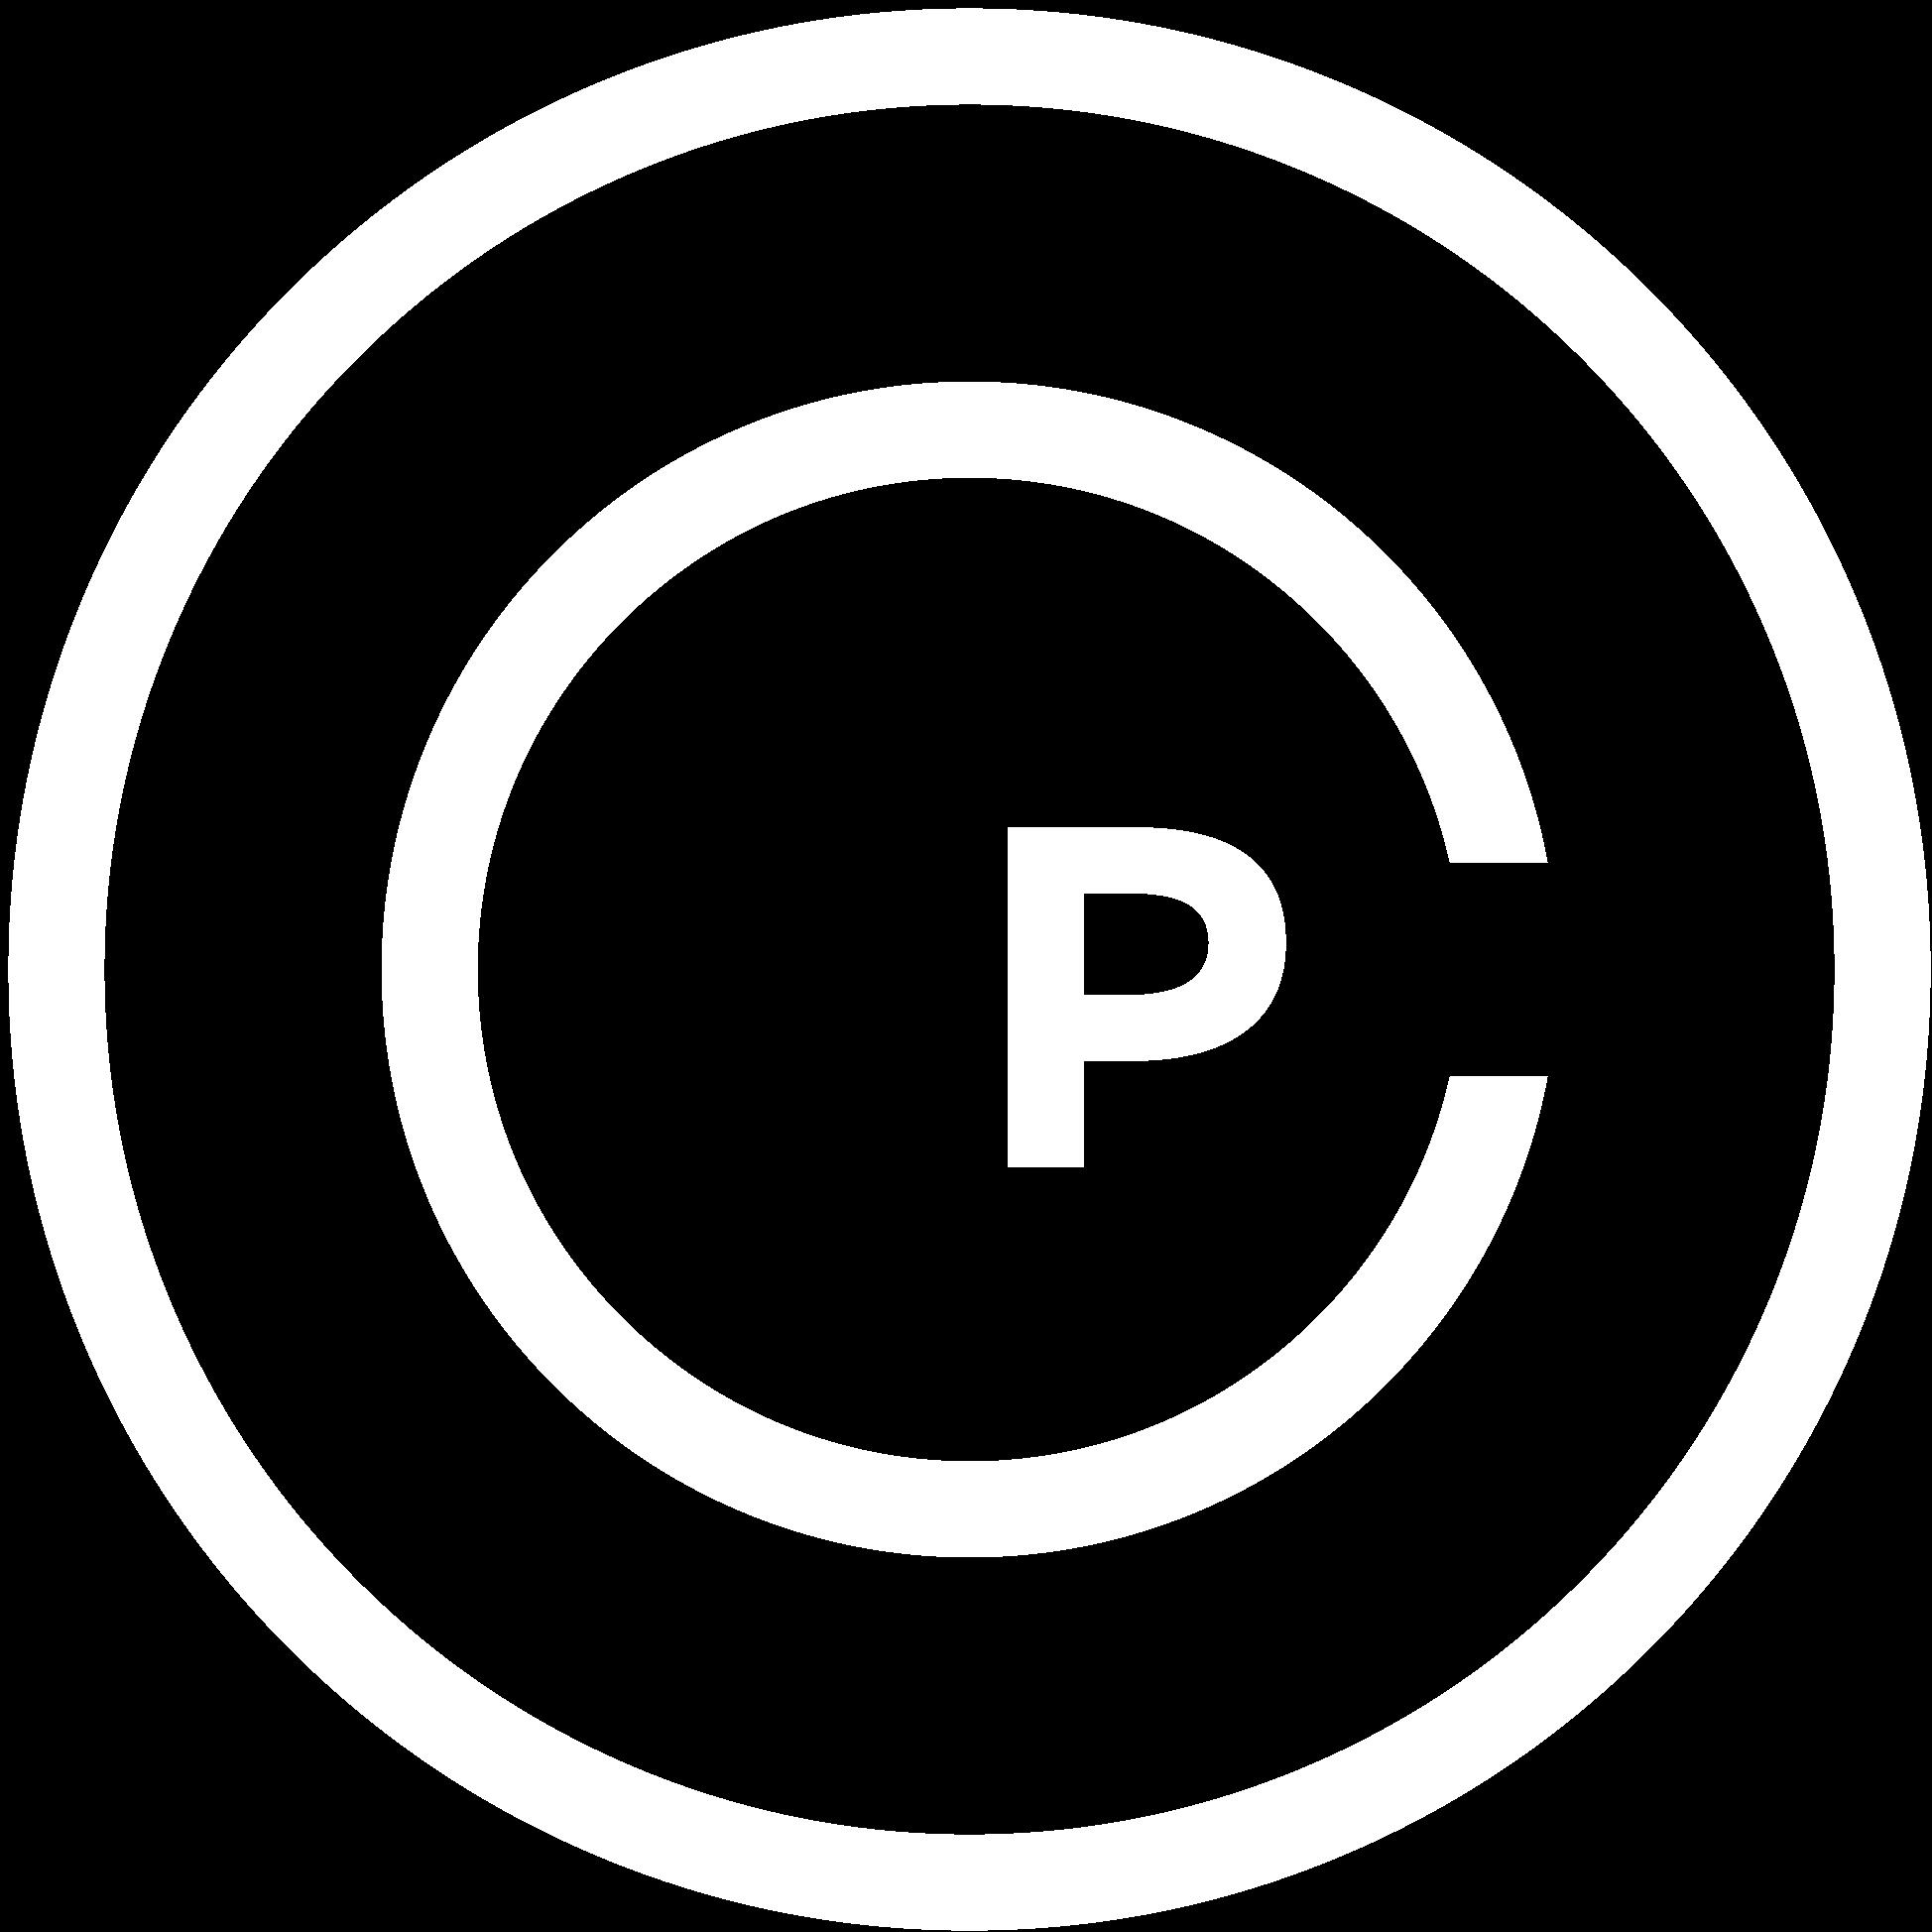 qb_priority_circle_mark_white_small-09